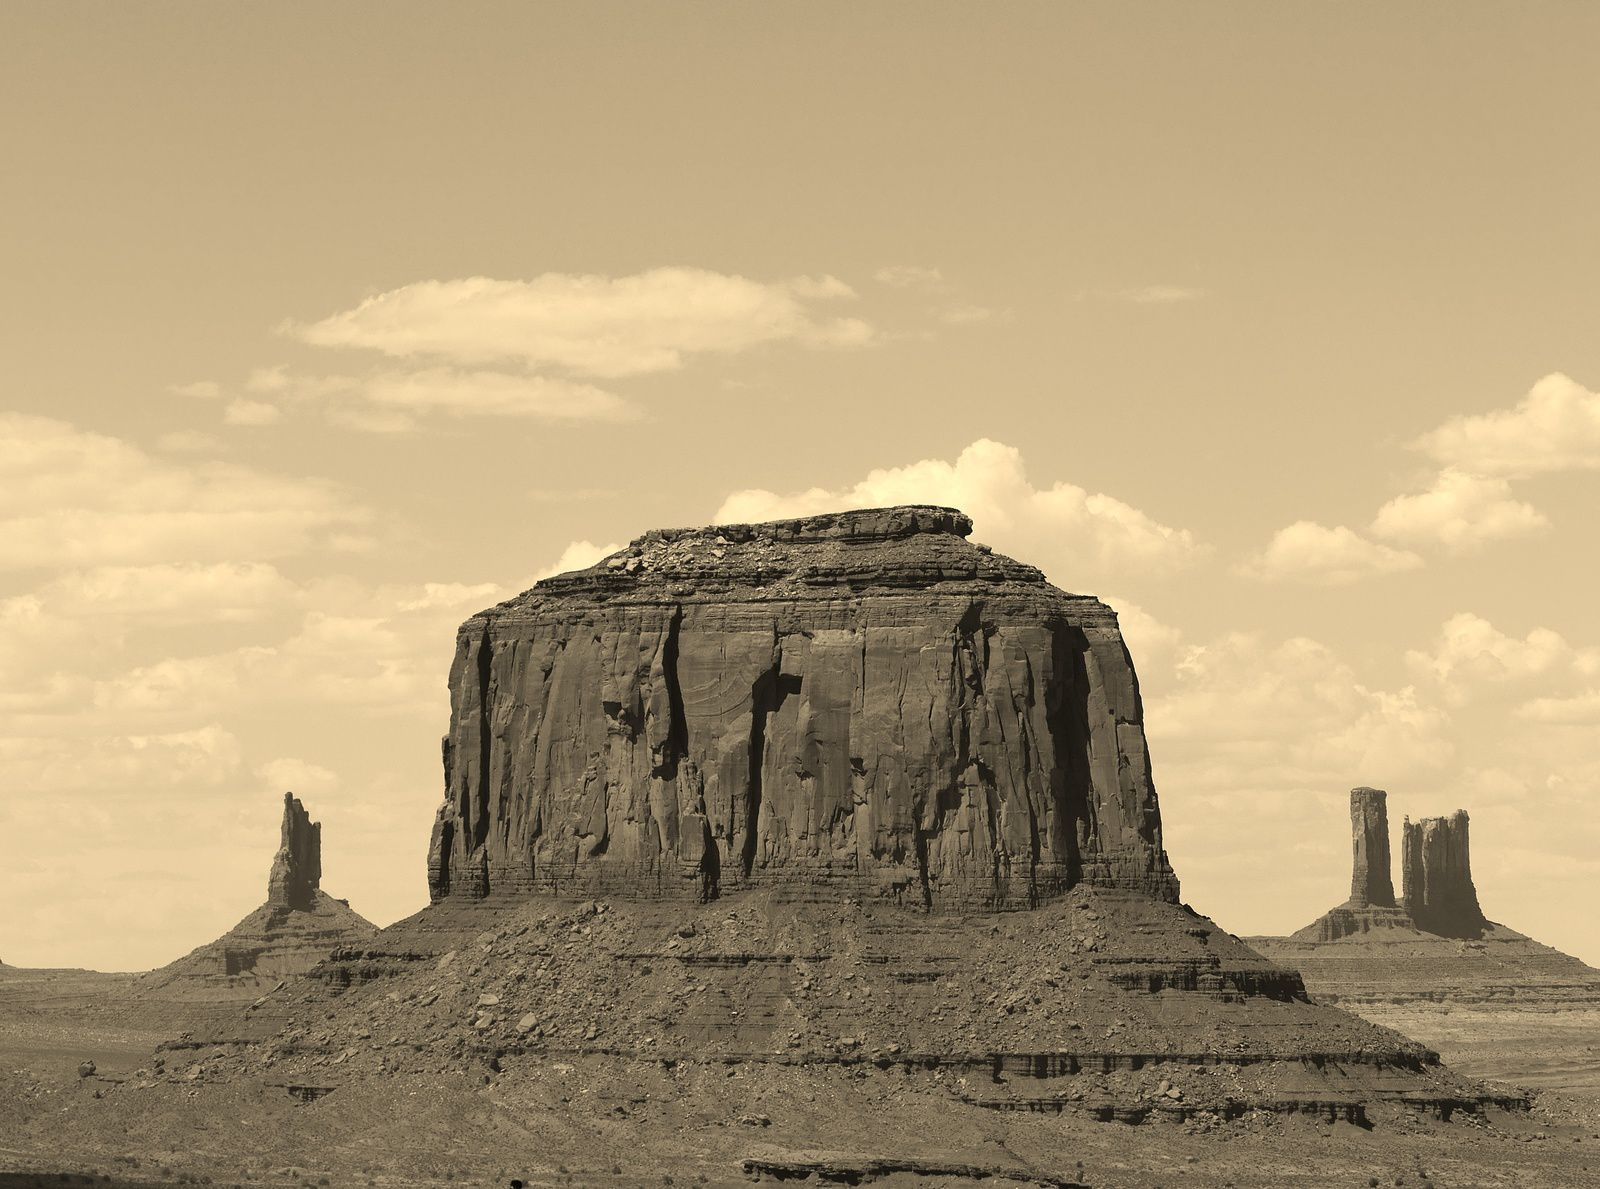 Monument valley, Arizona/Utha , USA, by Chry